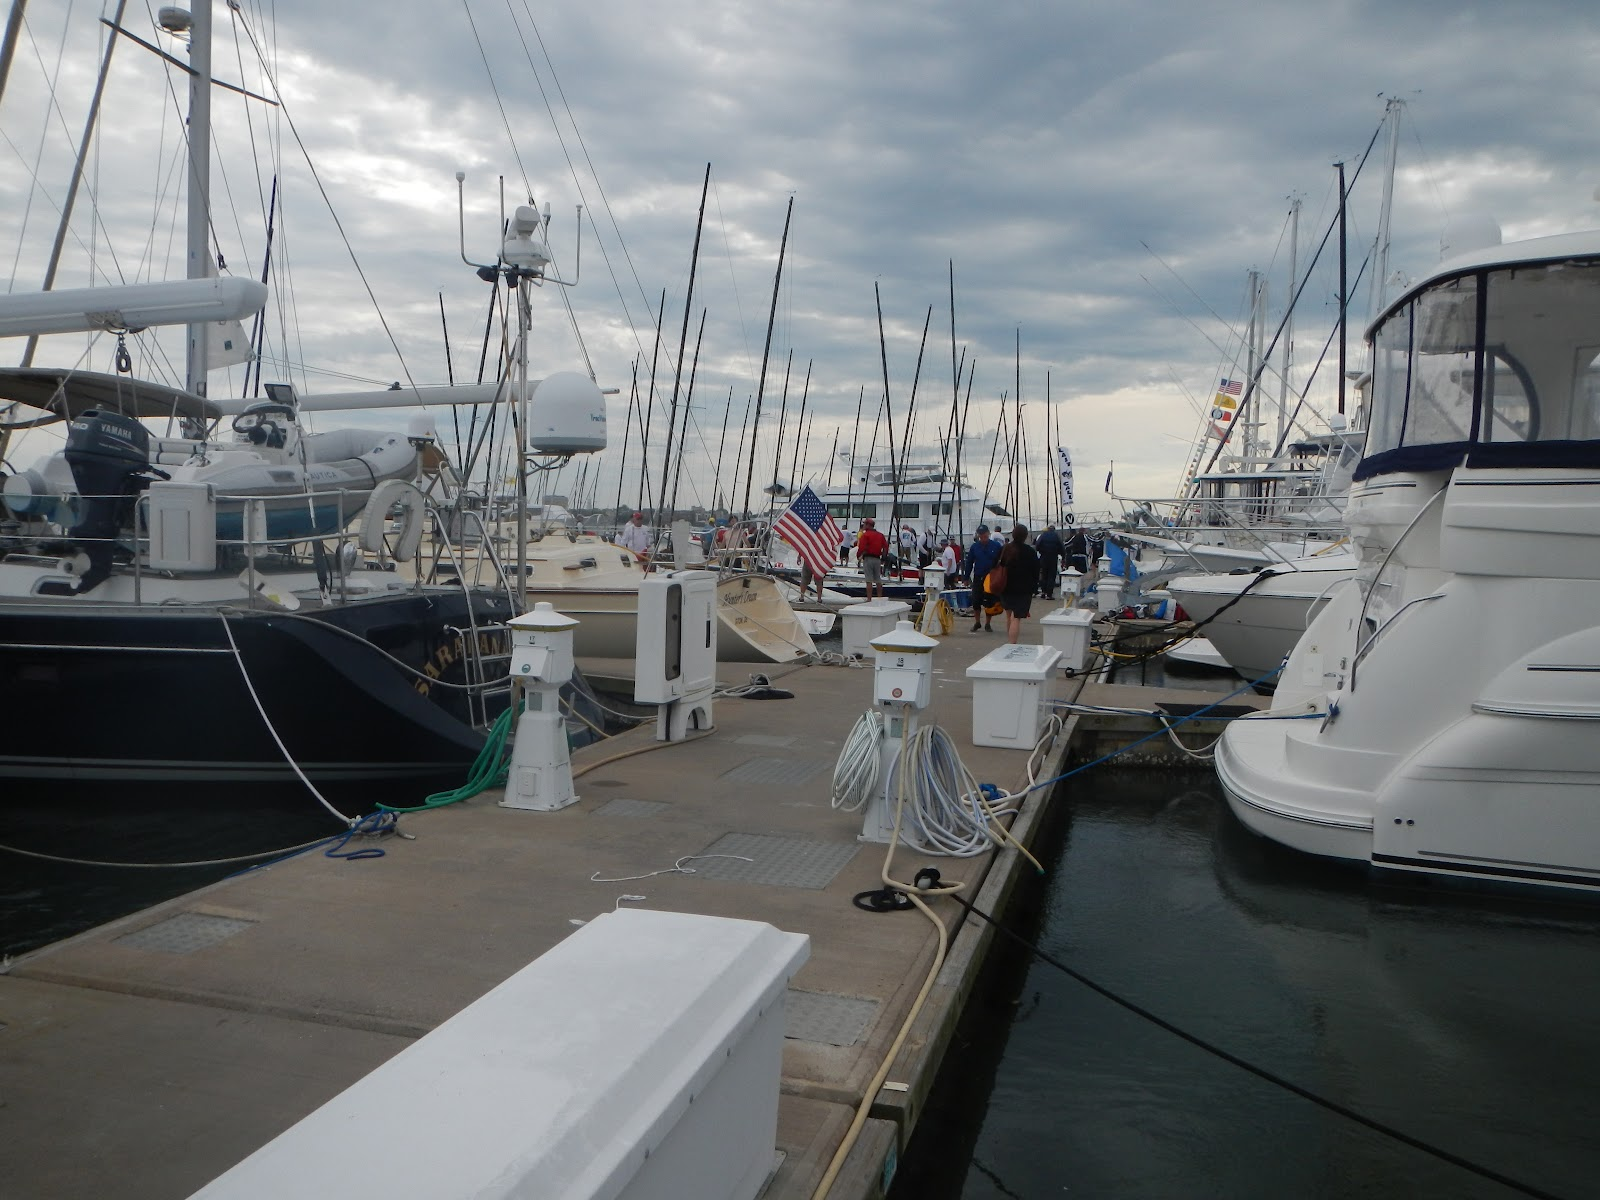 Adidas Boat CC Lace Shoe Review | APS Advisor